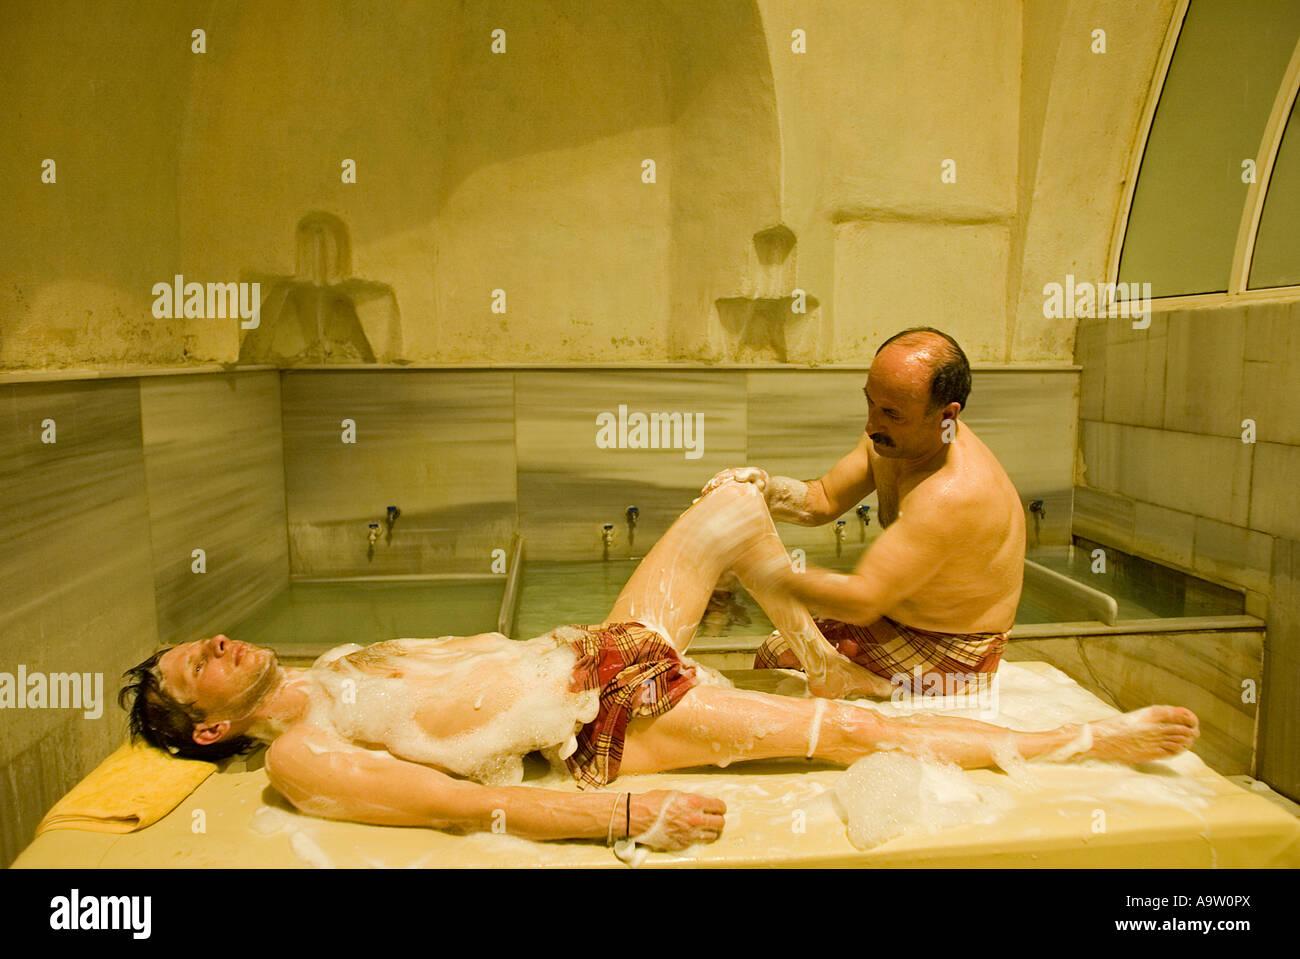 Turkish Massage Stock Photos & Turkish Massage Stock Images - Alamy